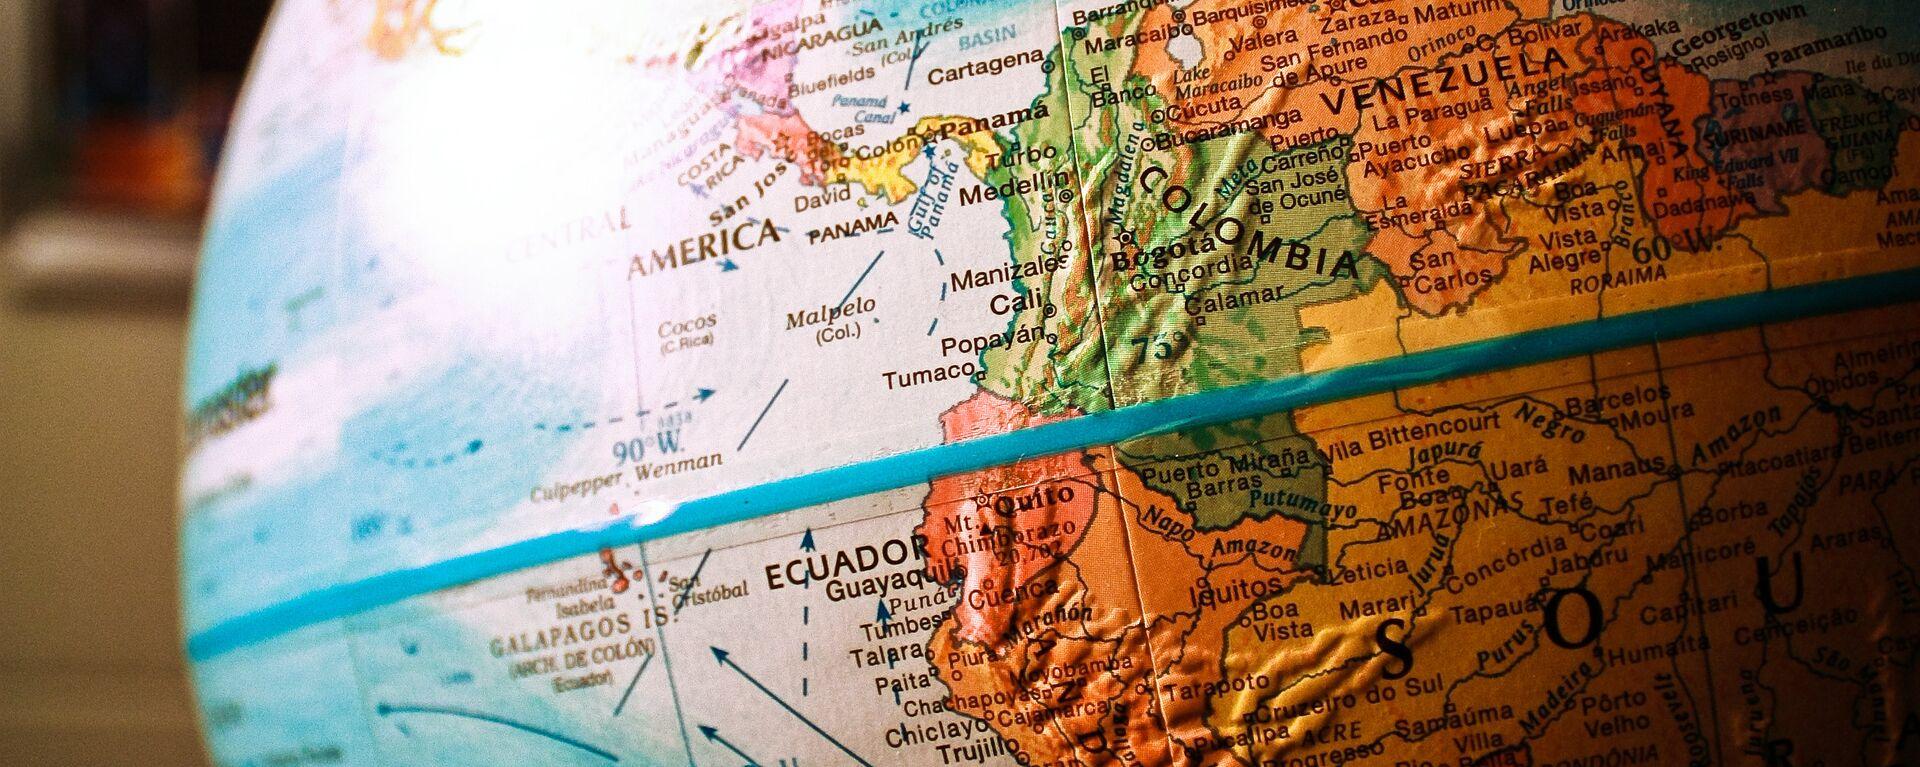 Mapa de América del Sur - Sputnik Mundo, 1920, 31.08.2021